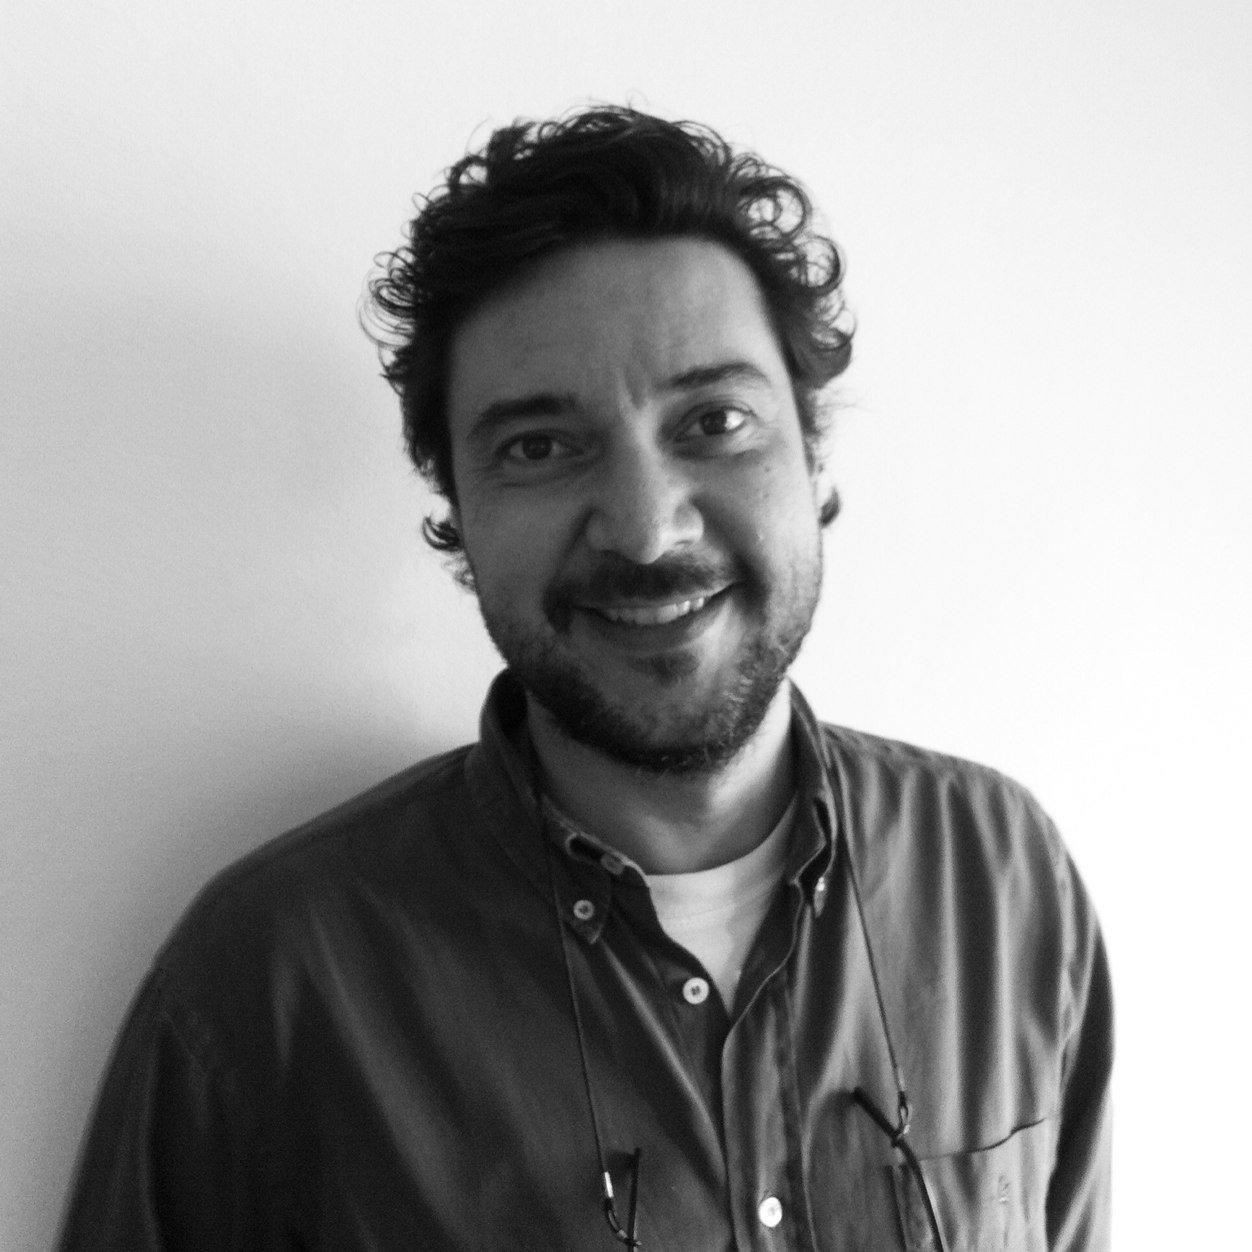 Marco Ansaloni